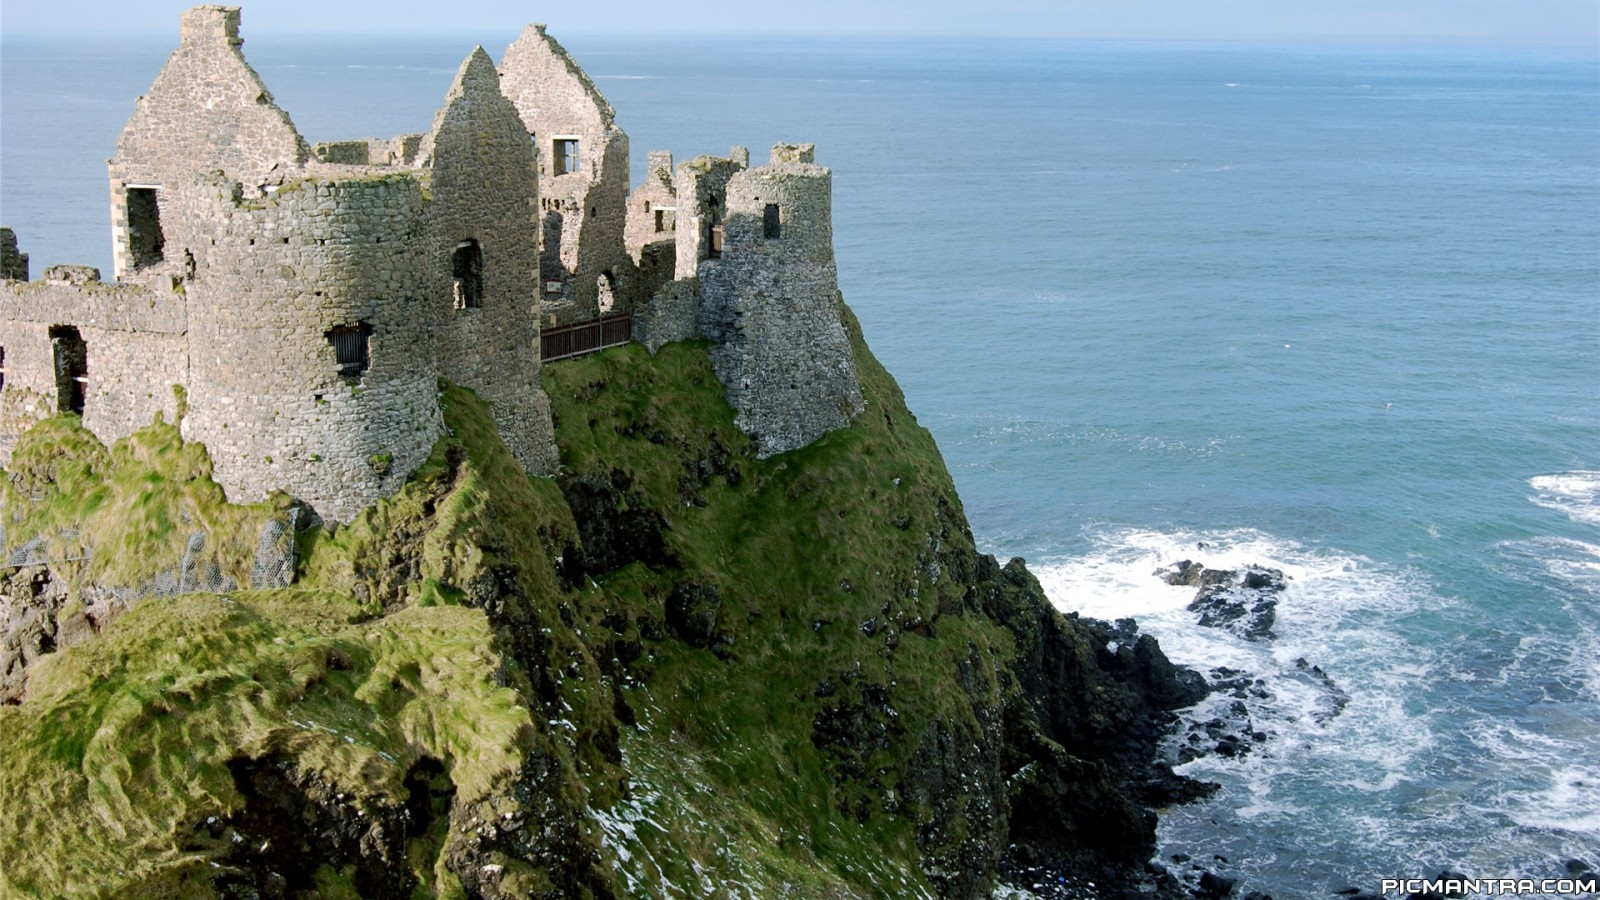 Irish Castle Wallpaper Background - WallpaperSafari Ireland Castle Wallpaper